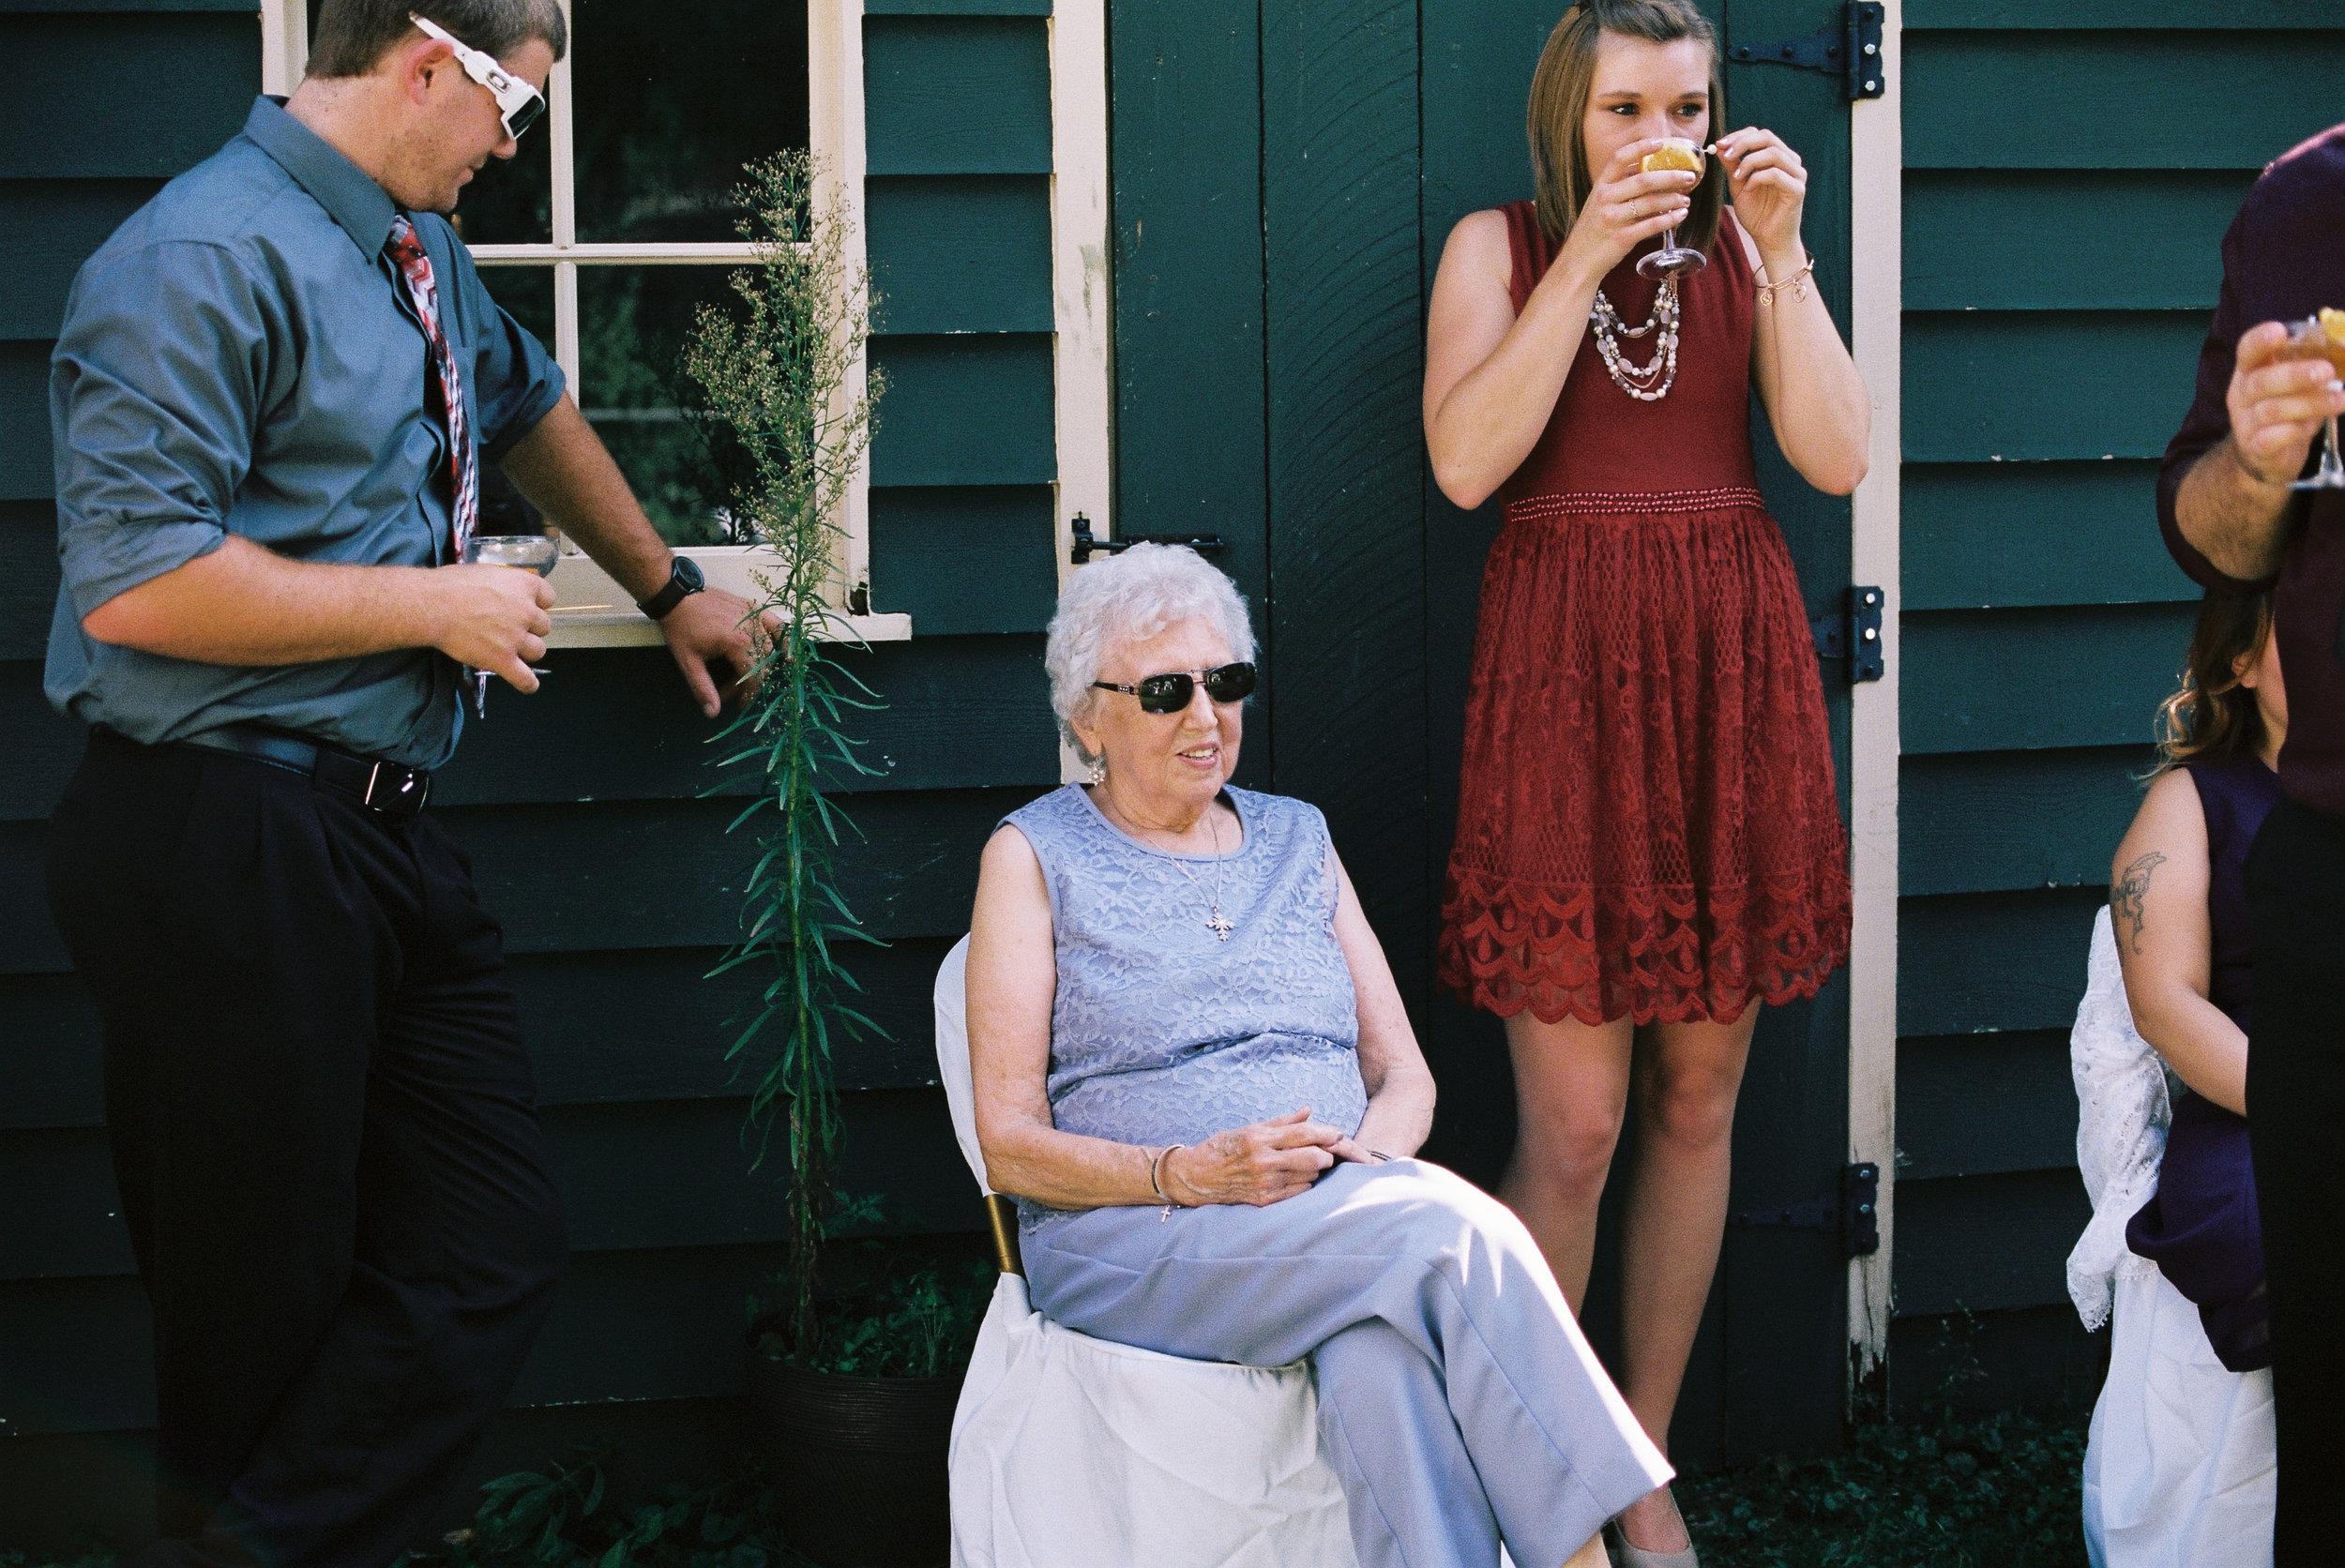 Grandma and family